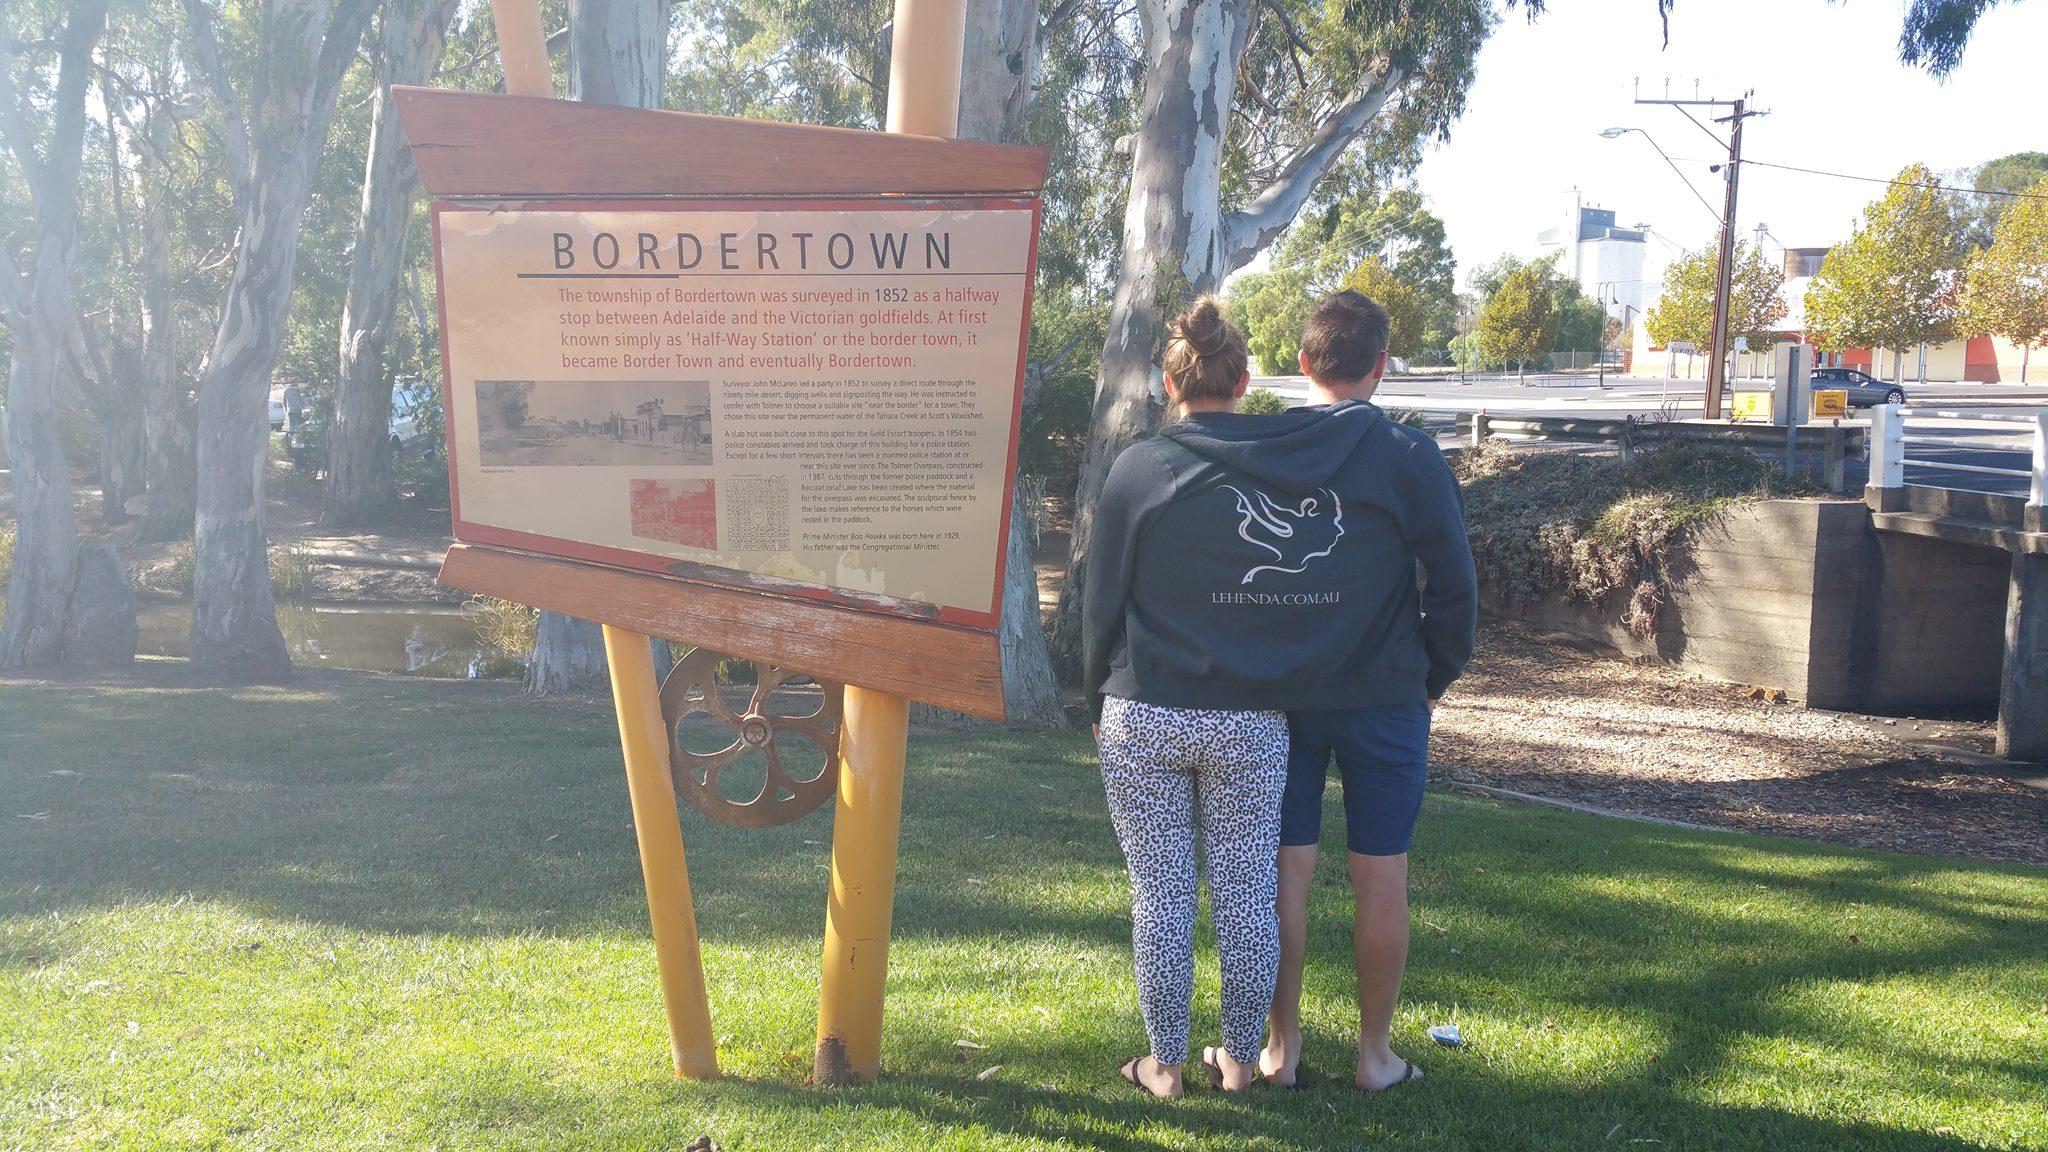 Larry & Adam in Bordertown South Australia